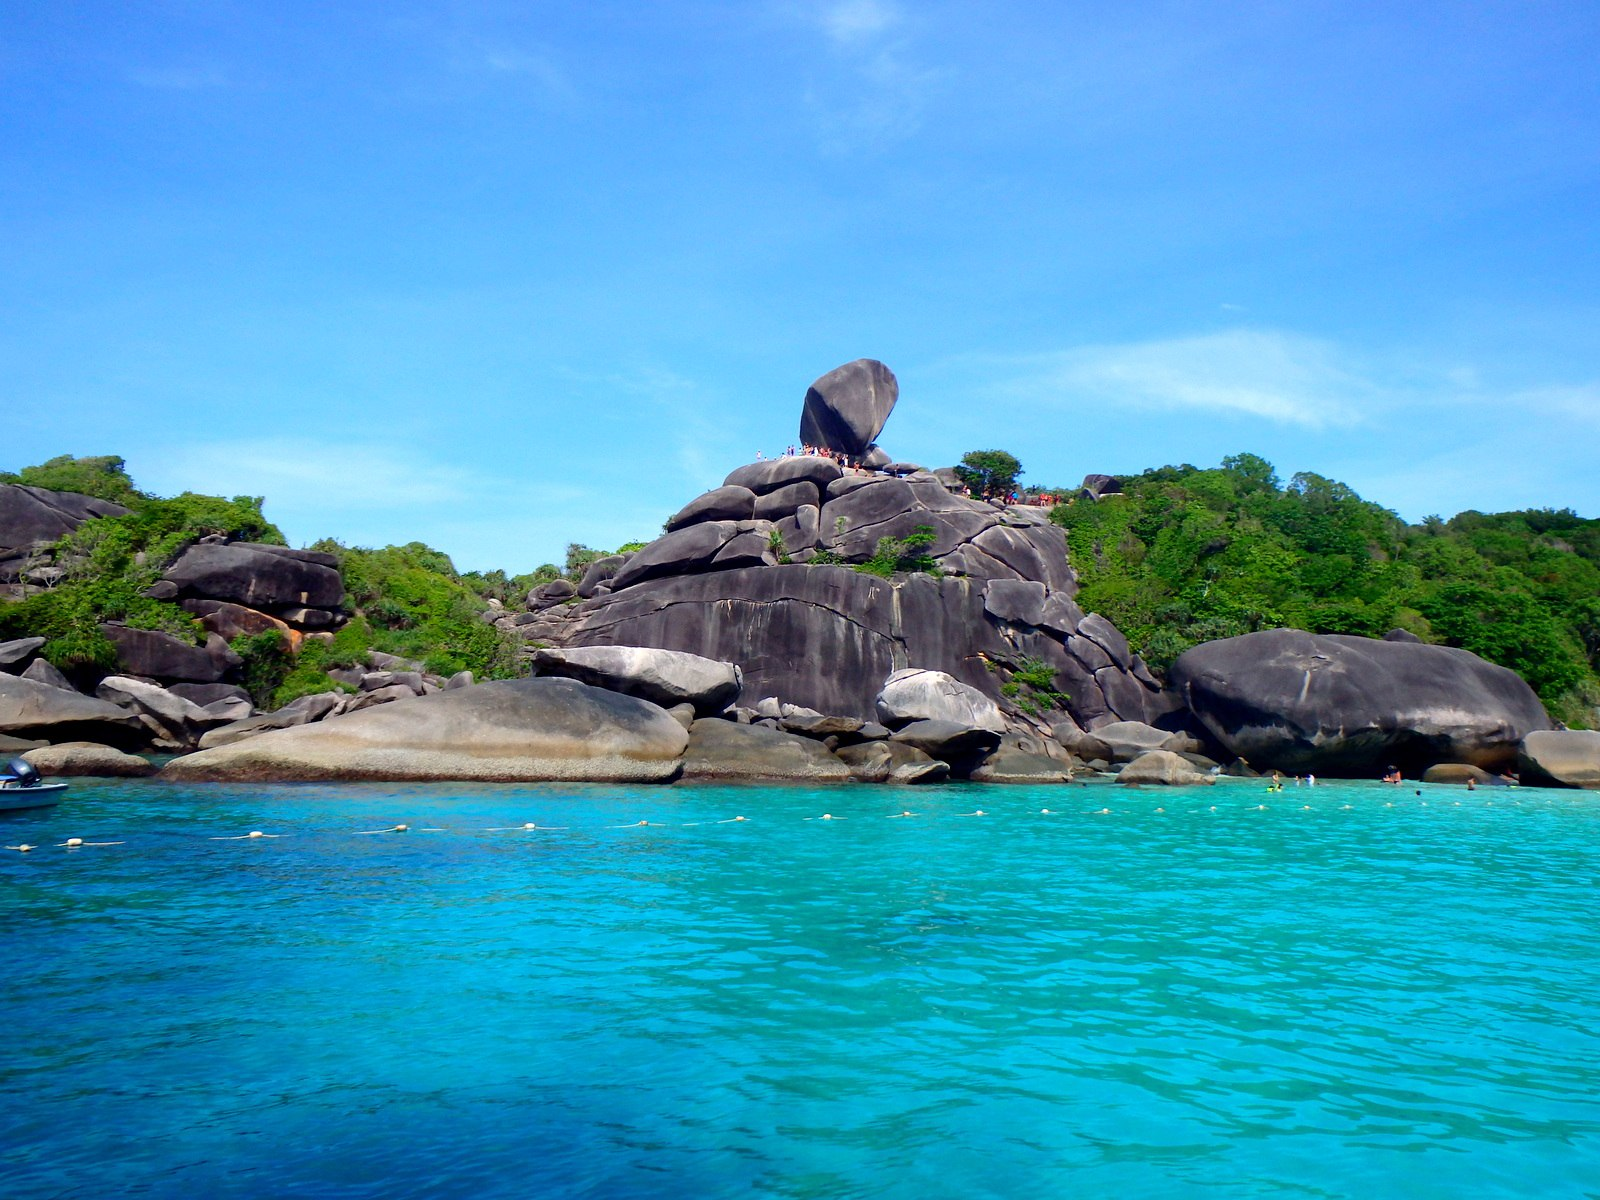 Thailand Beach Vacation: Similan Islands VS Koh Phi Phi ...